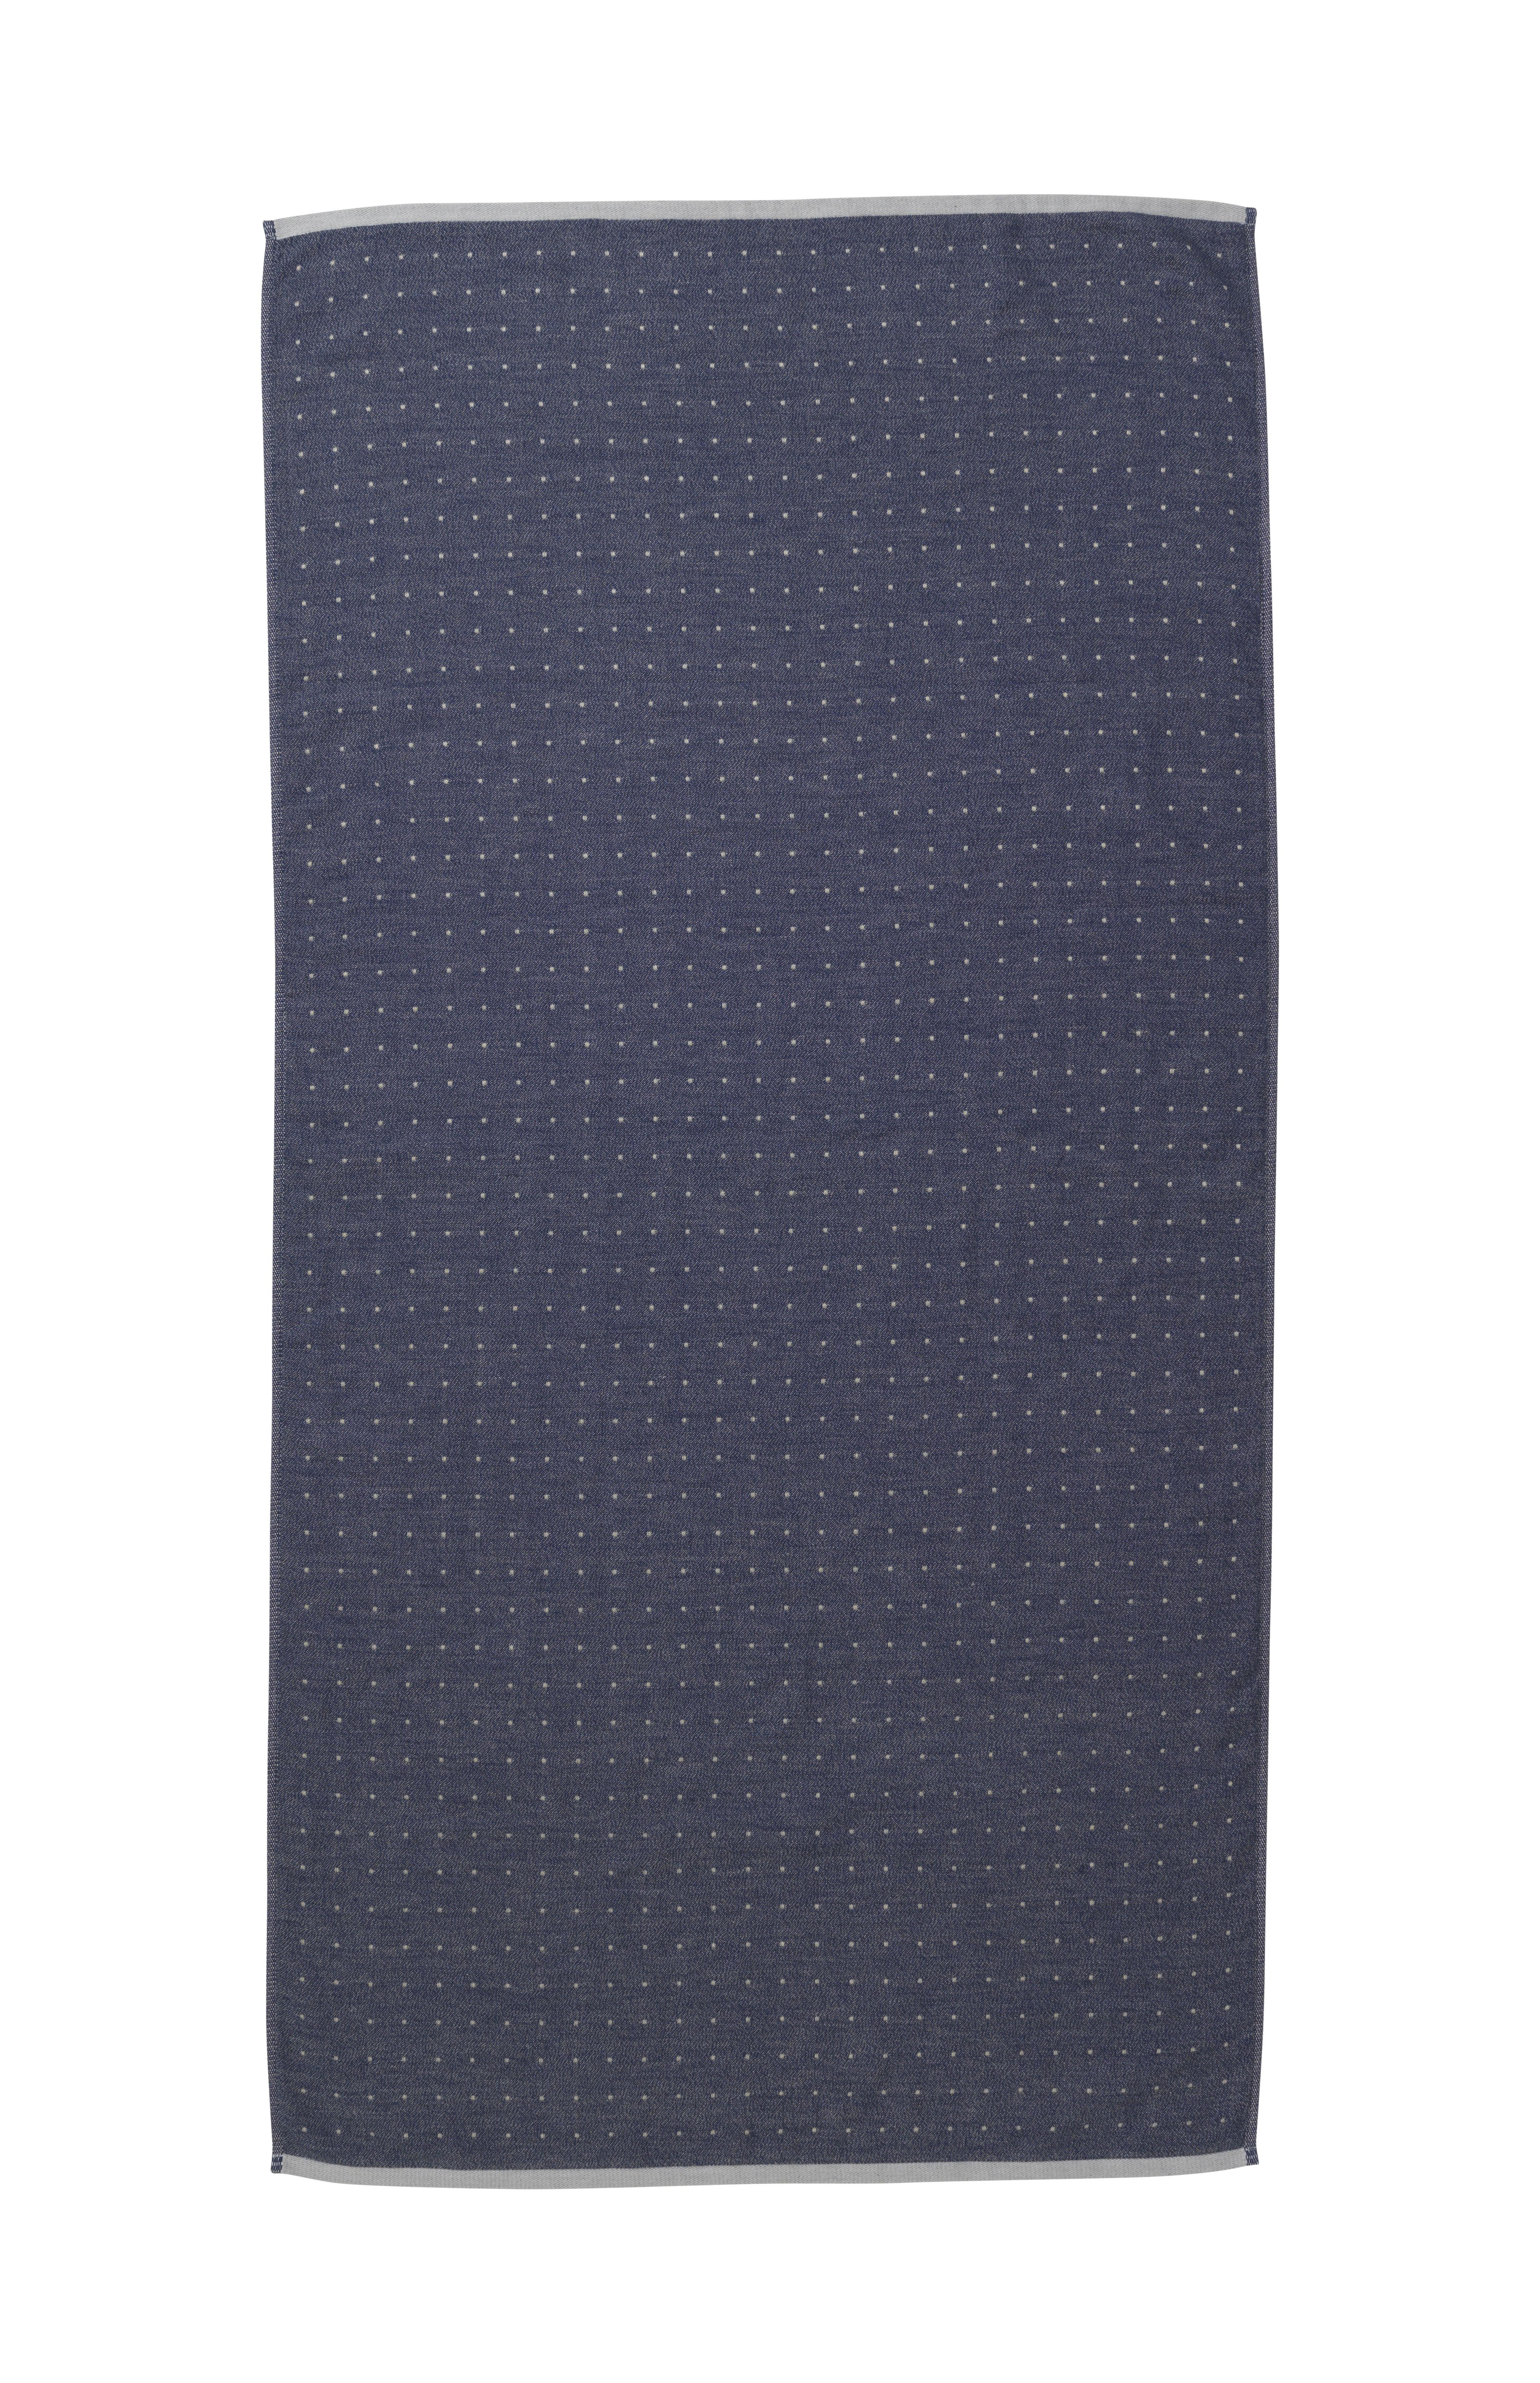 Decoration - Bedding & Bath Towels - Sento Bath towel - / Organic - 140 x 70 cm by Ferm Living - Bleu - Cotton